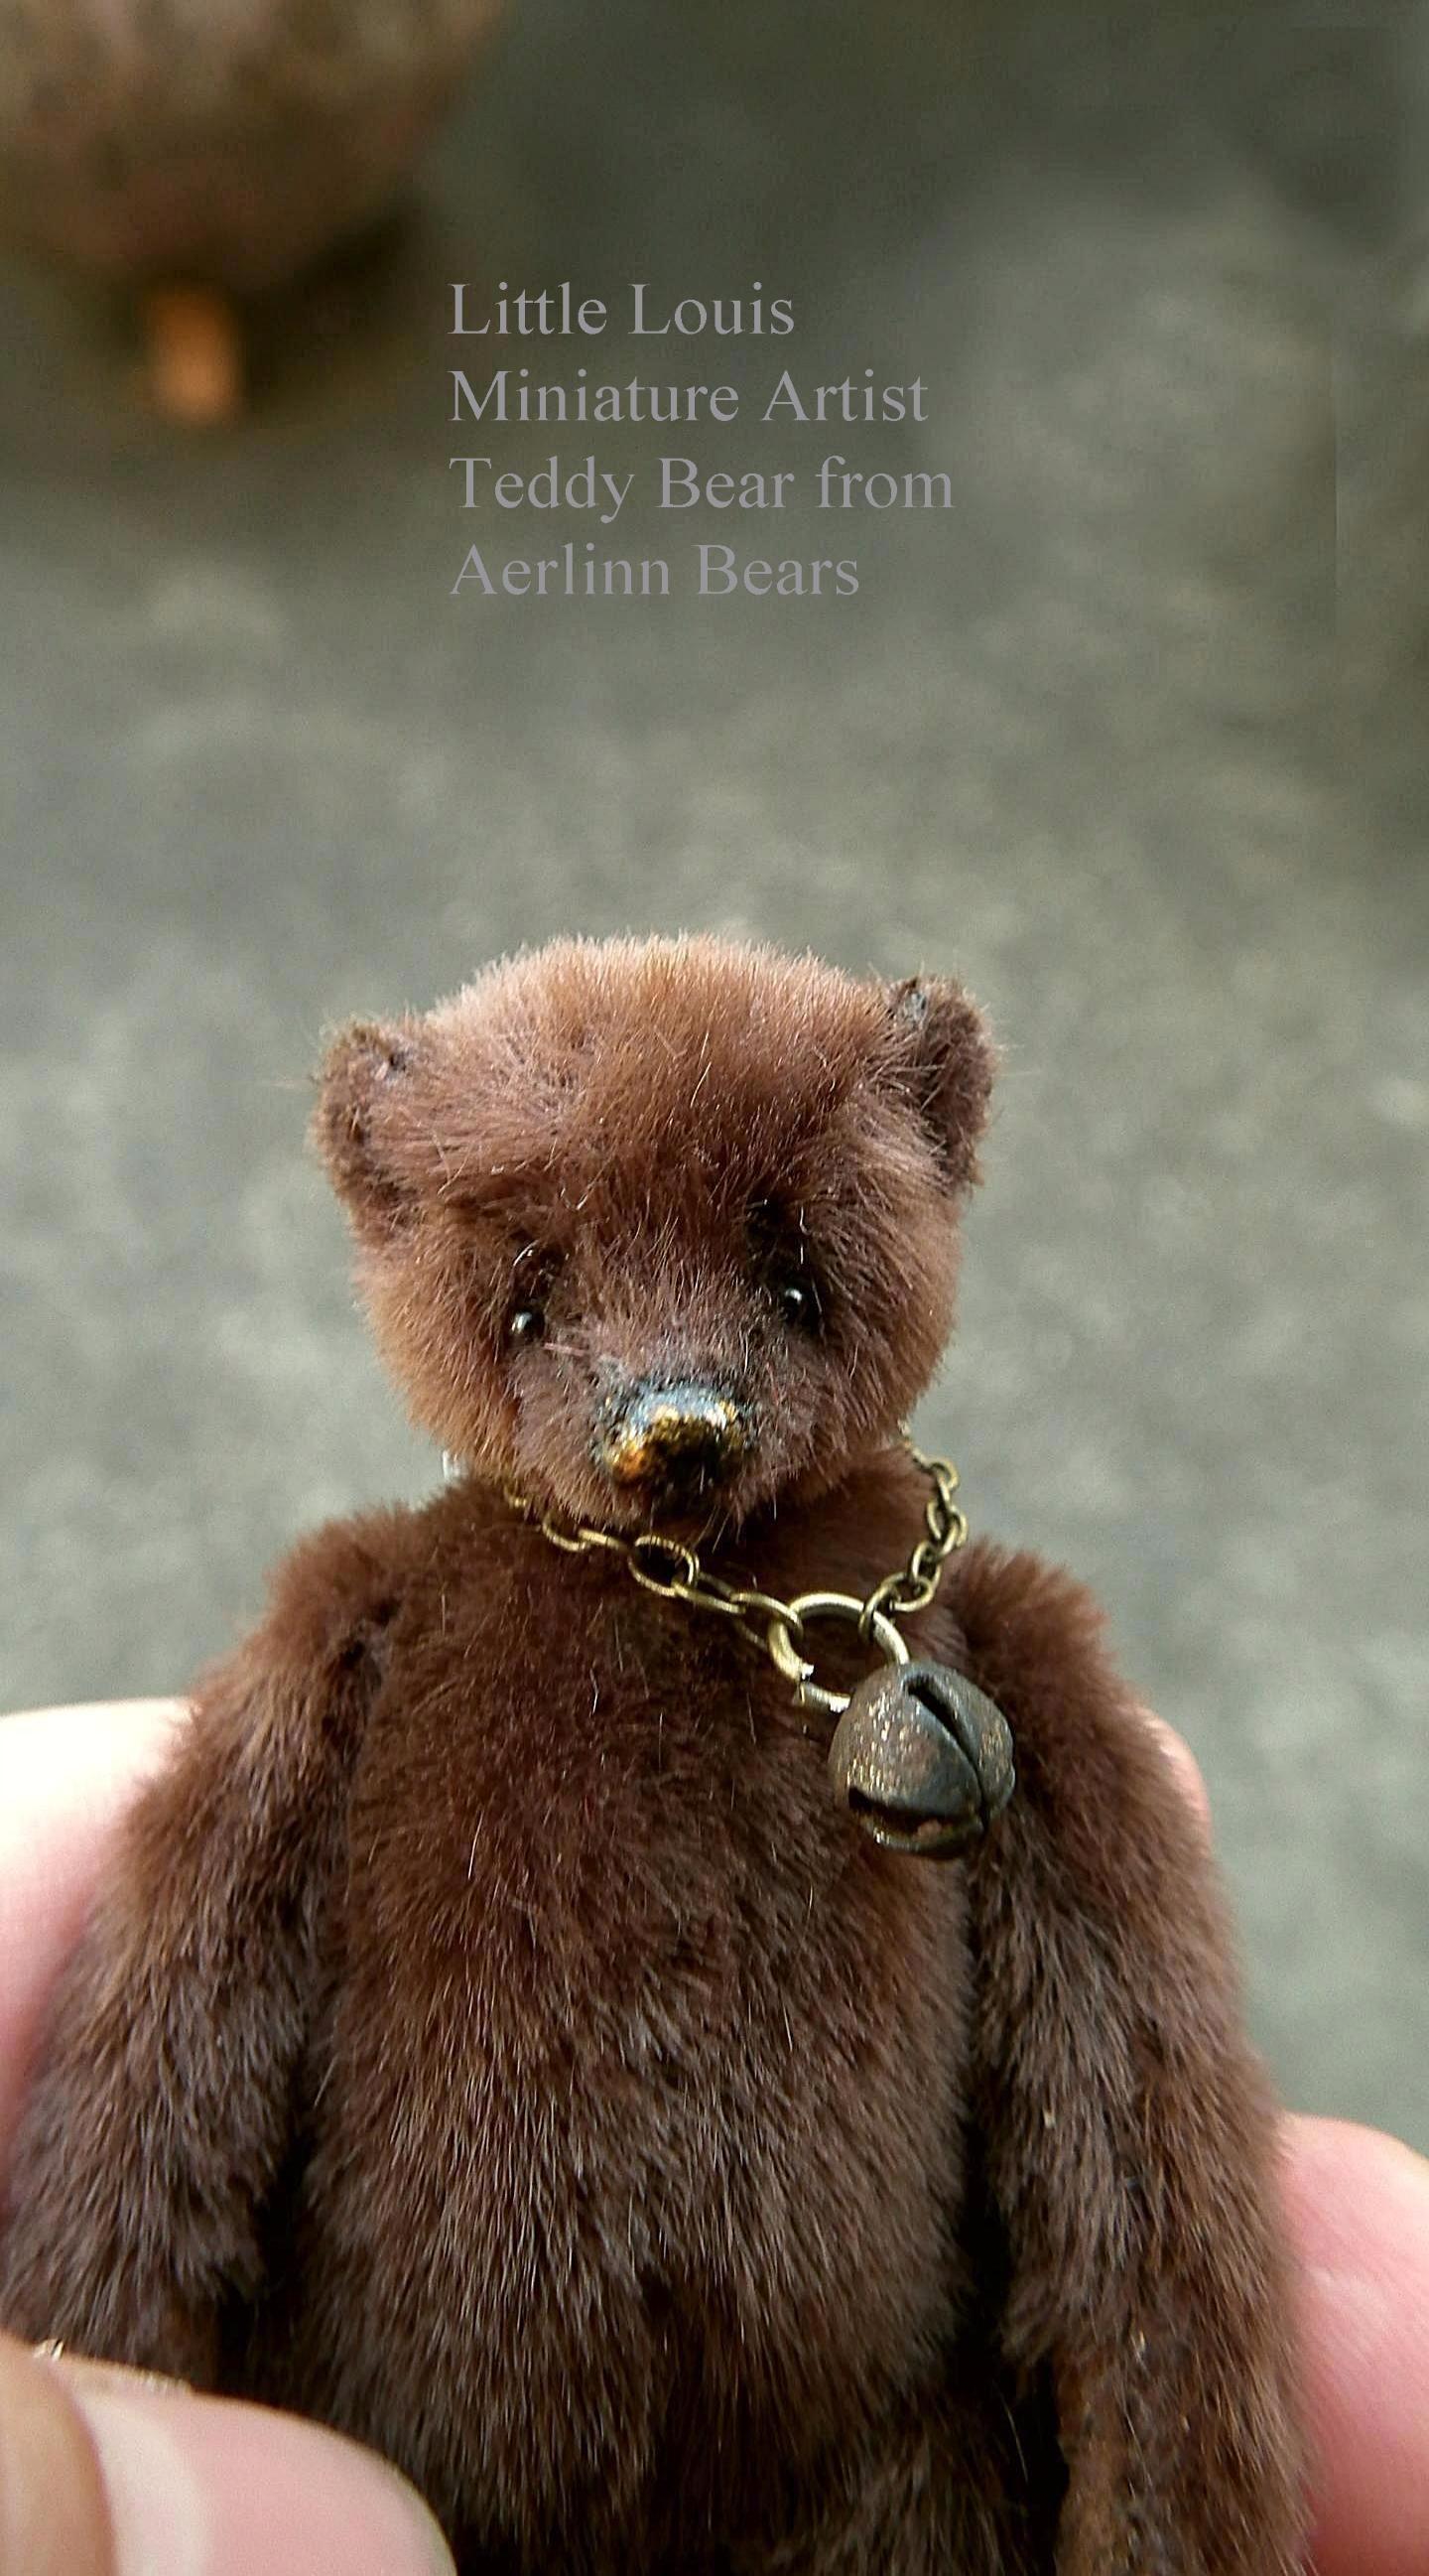 Little Louis 2 3 4 Miniature Artist Teddy Bear From Aerlinn Bears Cuddly Teddy Bear Teddy Bear Doll Bear Stuffed Animal [ 2595 x 1440 Pixel ]